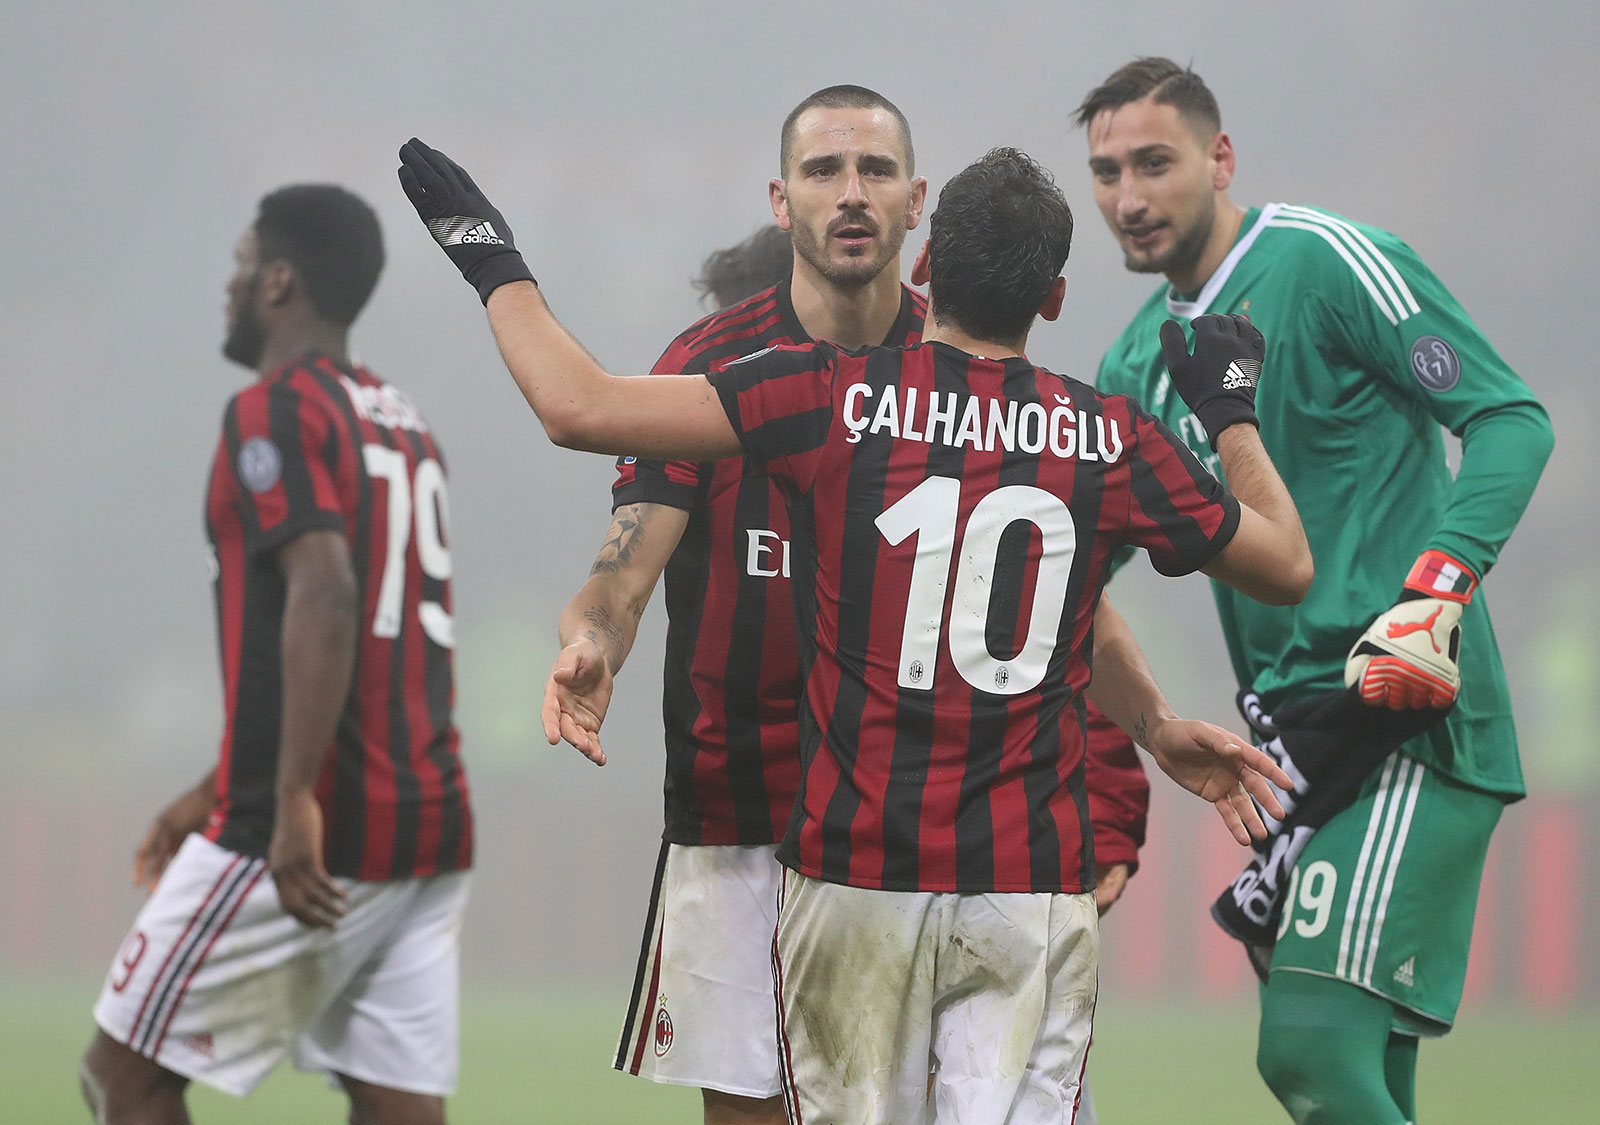 Hakan Çalhanoğlu, Leonardo Bonucci and Gianluigi Donnarumma celebrating at the end of Milan-Lazio at Stadio San Siro on January 28, 2018.  (Photo by Marco Luzzani/Getty Images)